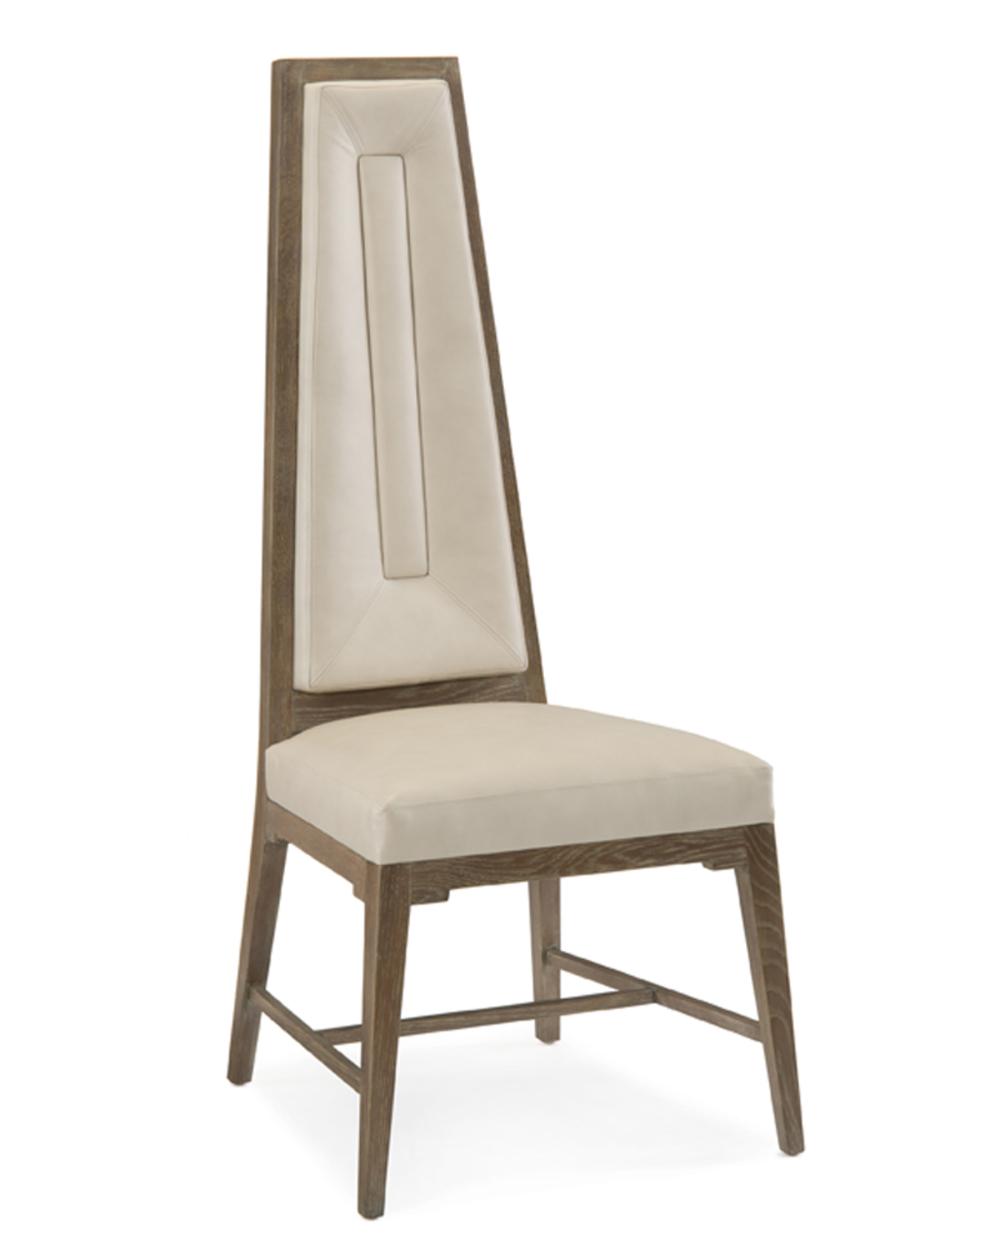 John Richard Collection - Driftwood Shard Dining Chair